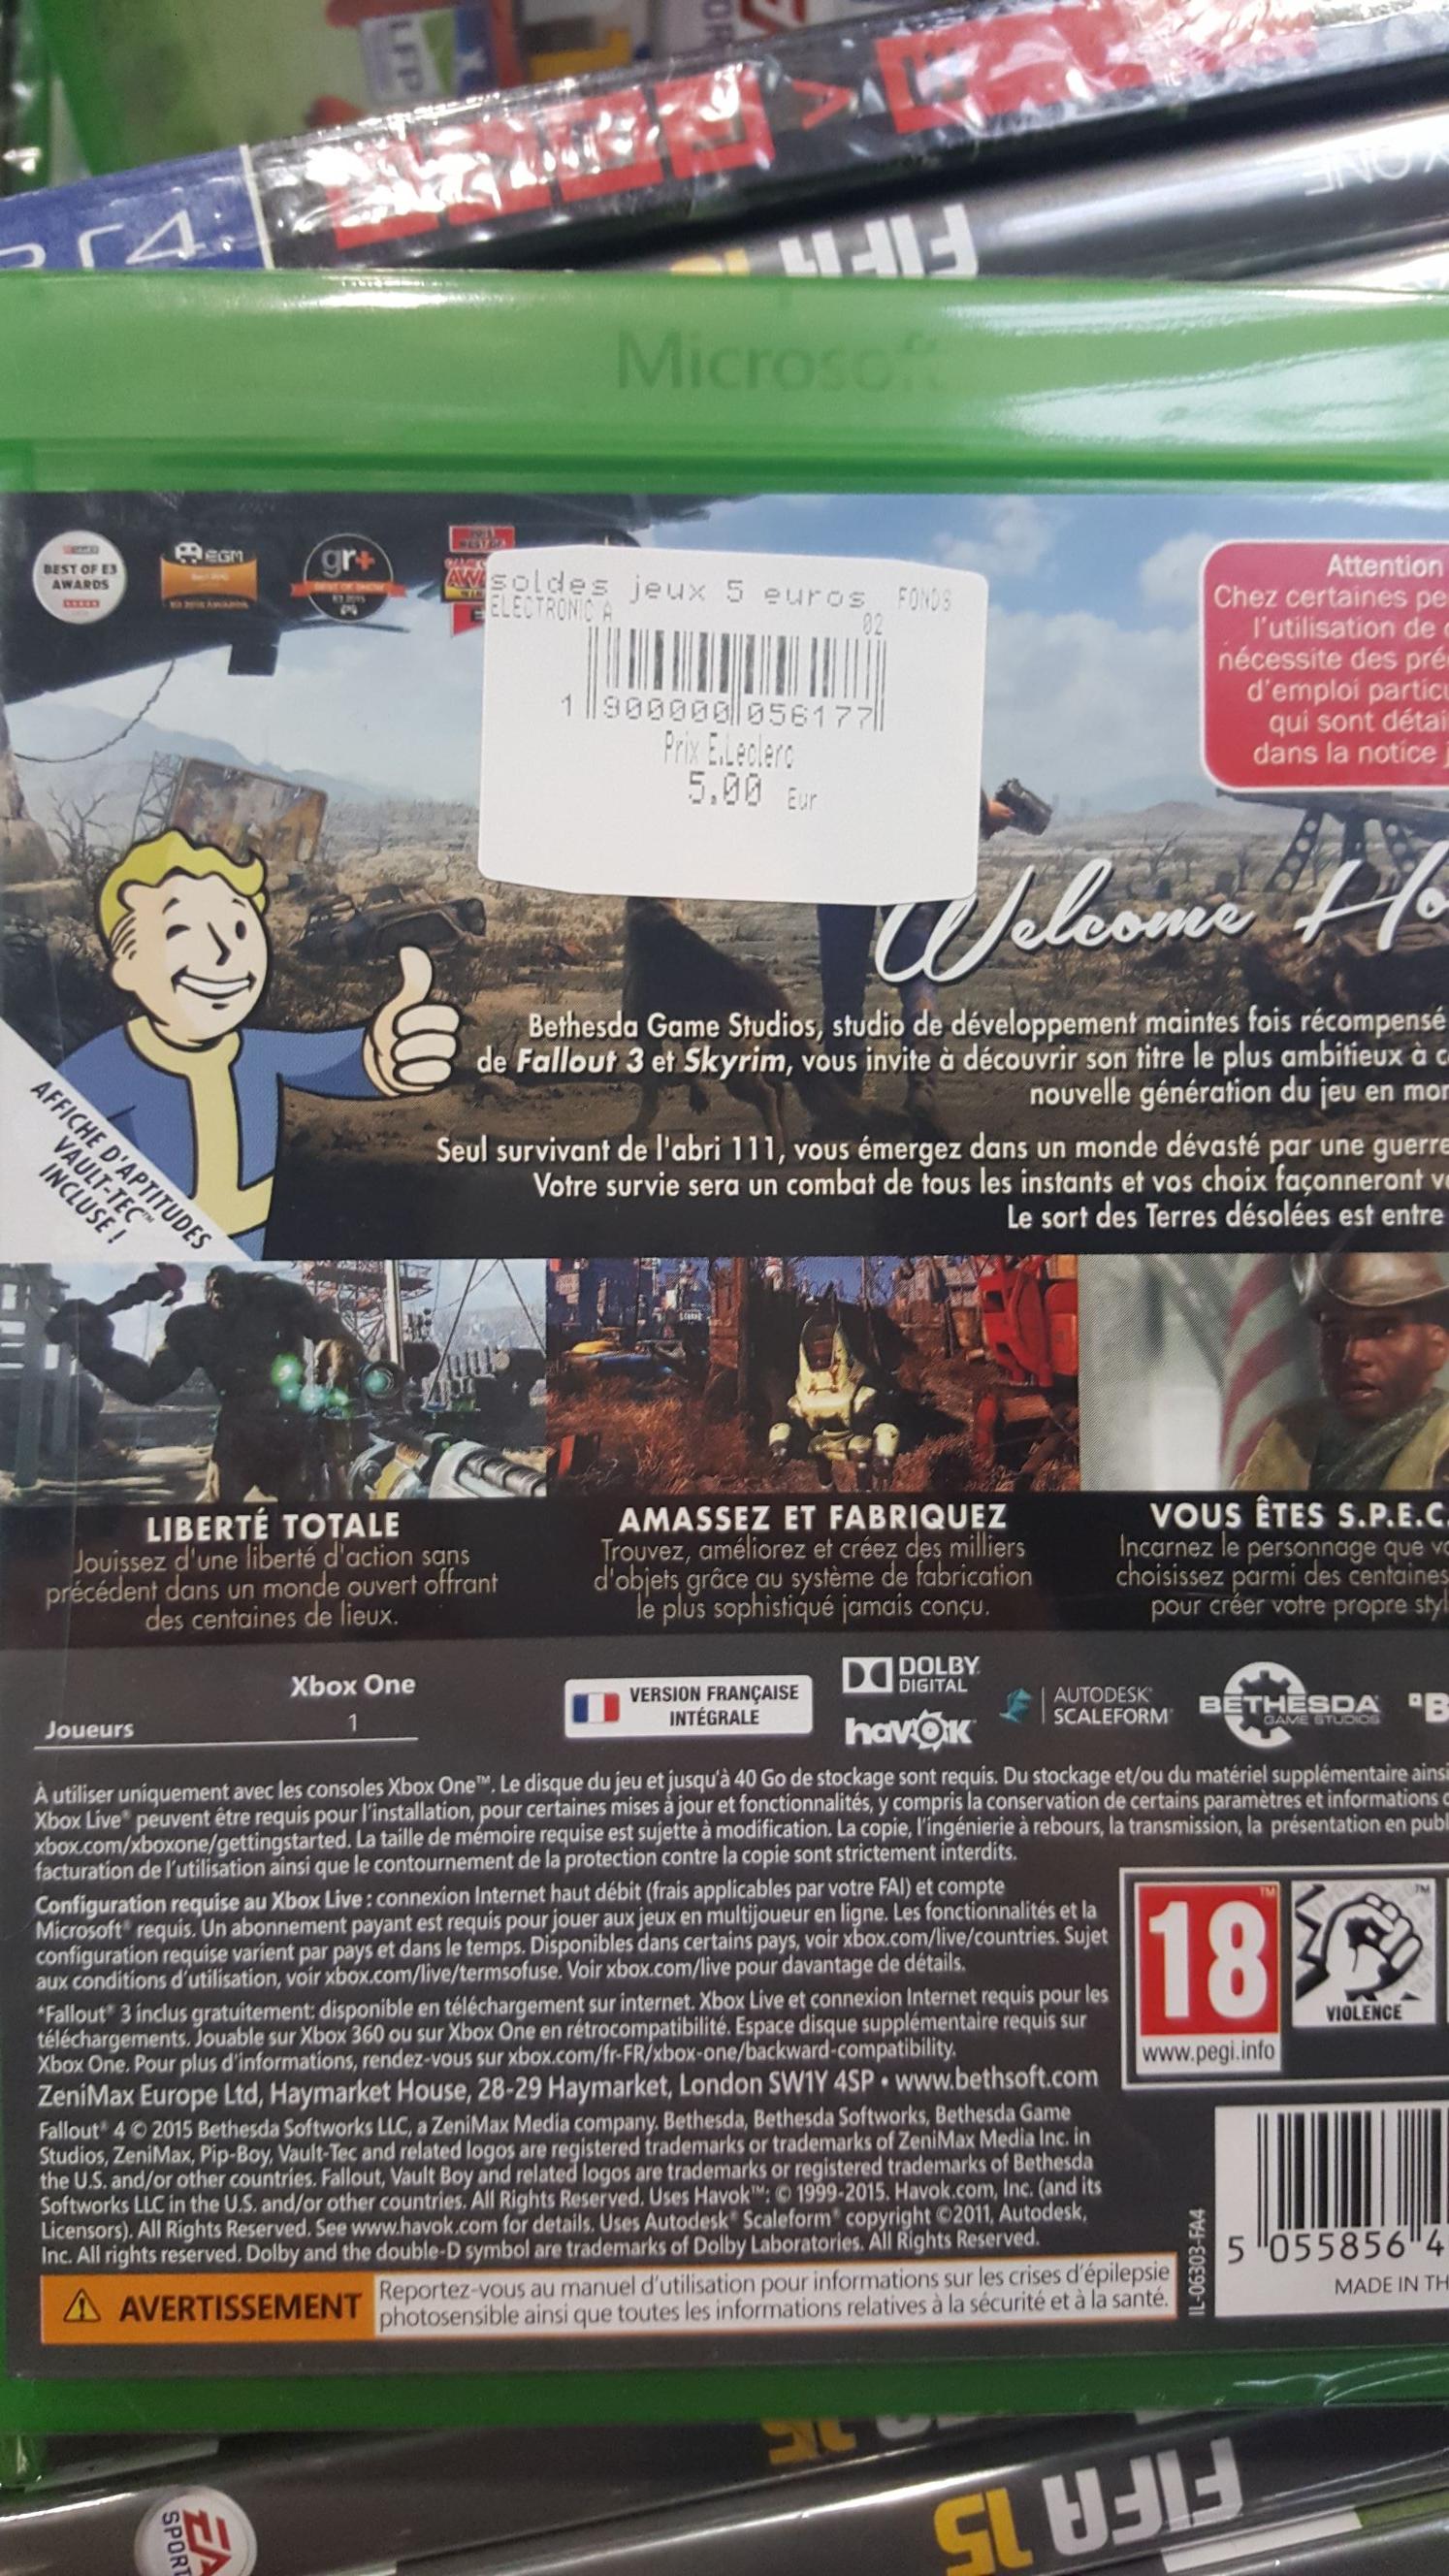 Fallout 4 sur Xbox One au E.Leclerc Le Blanc-Mesnil (93)